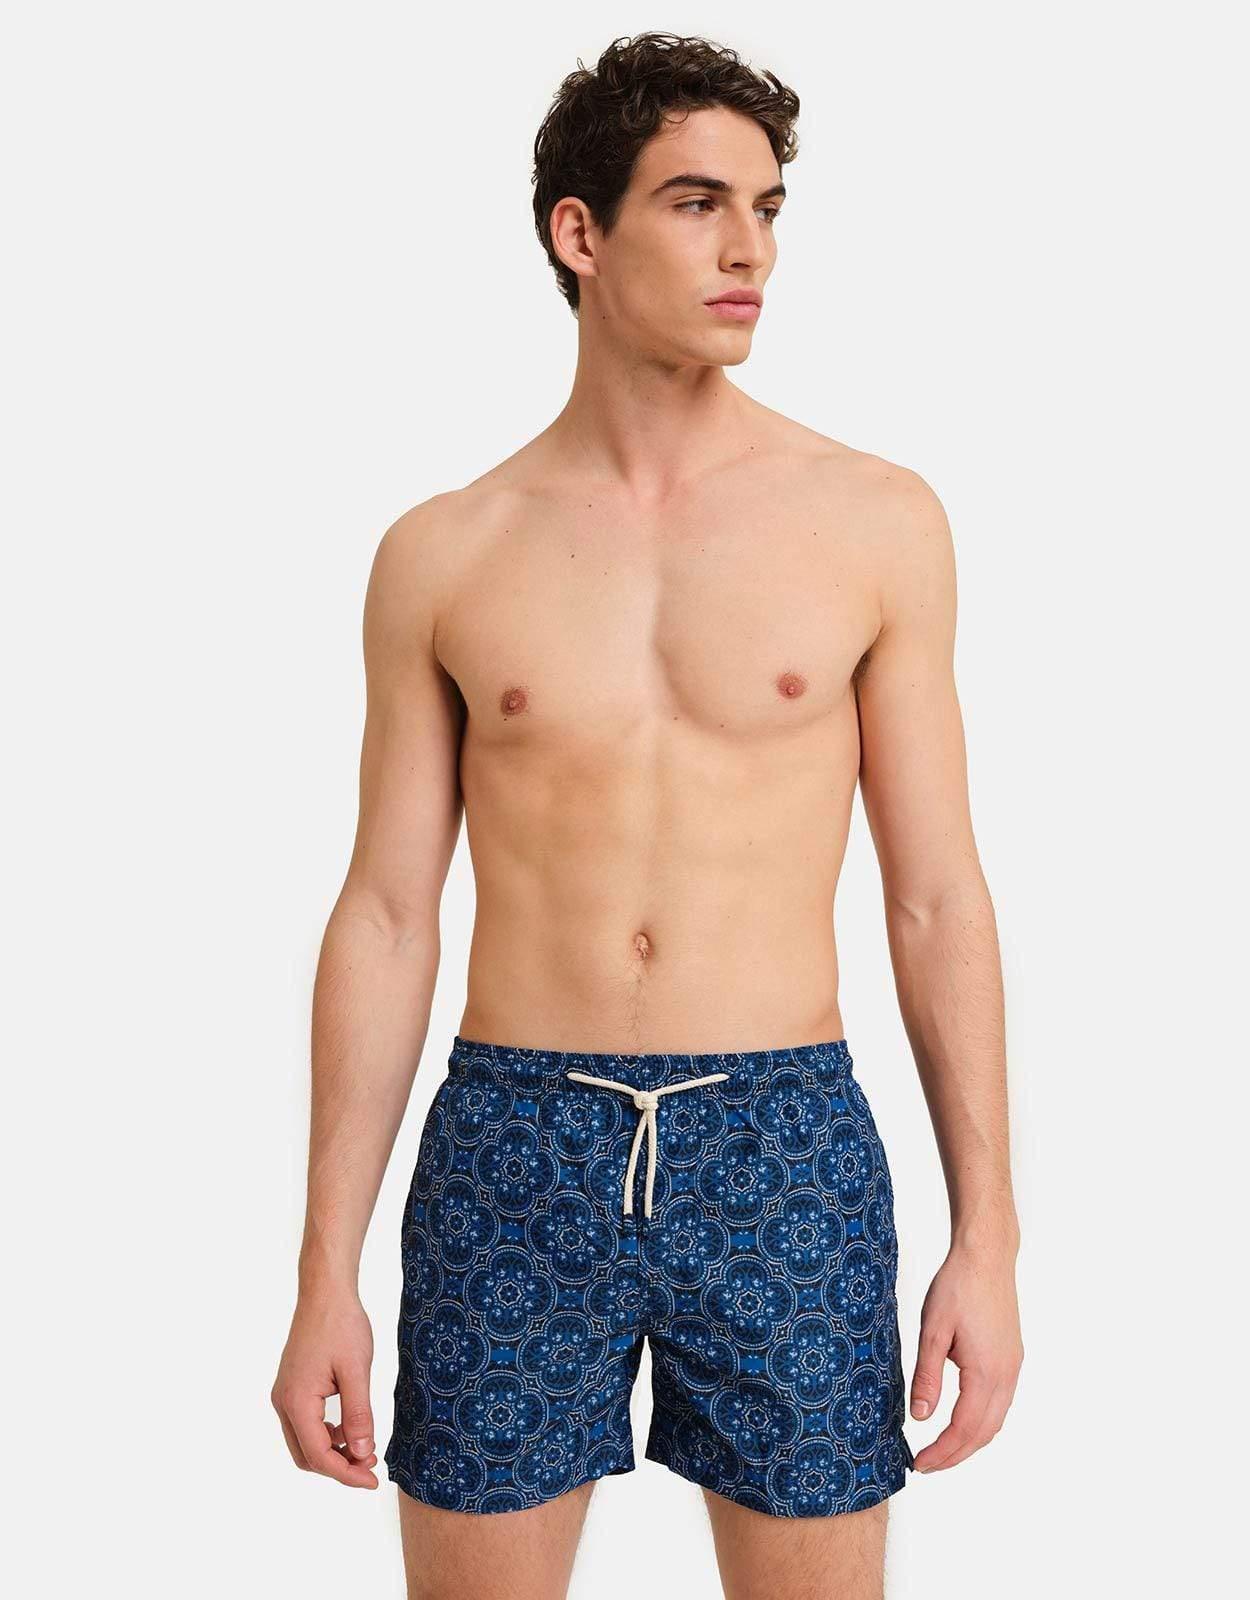 Peninsula Swimwear Clothing PROCIDA MICRO ELASTIC